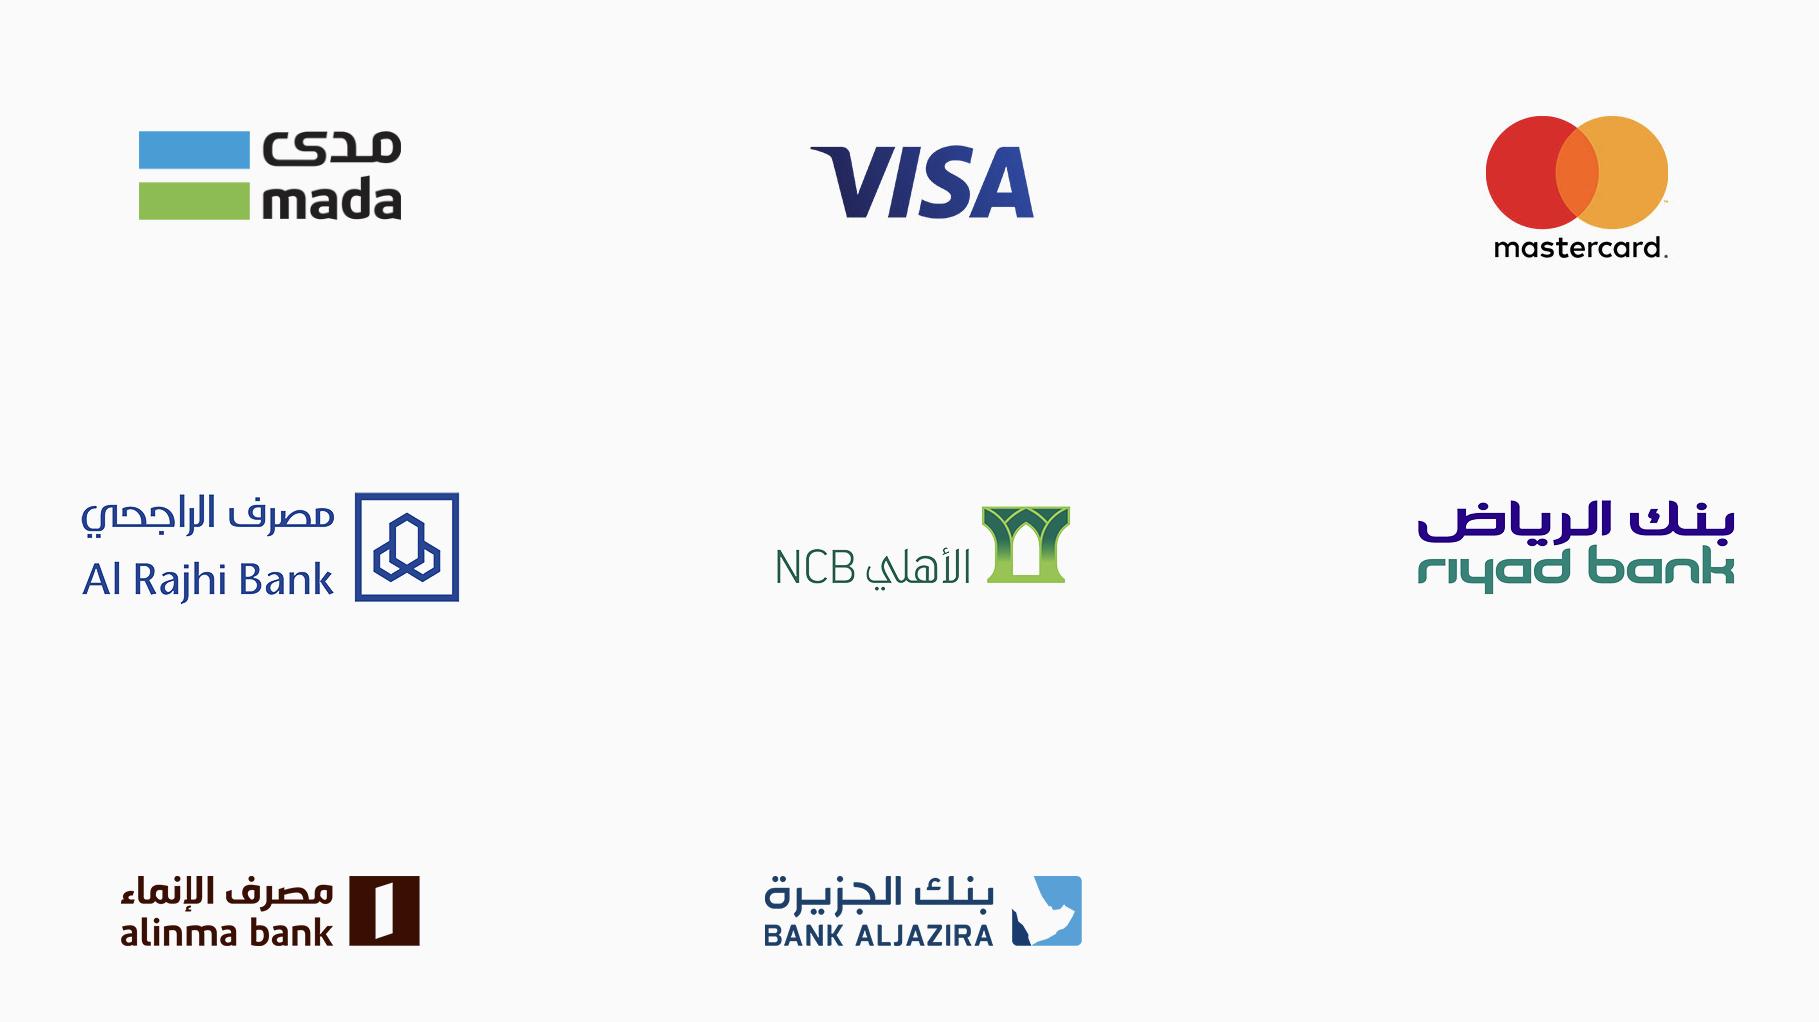 Banks List ماك ارابيا Mac Arabia